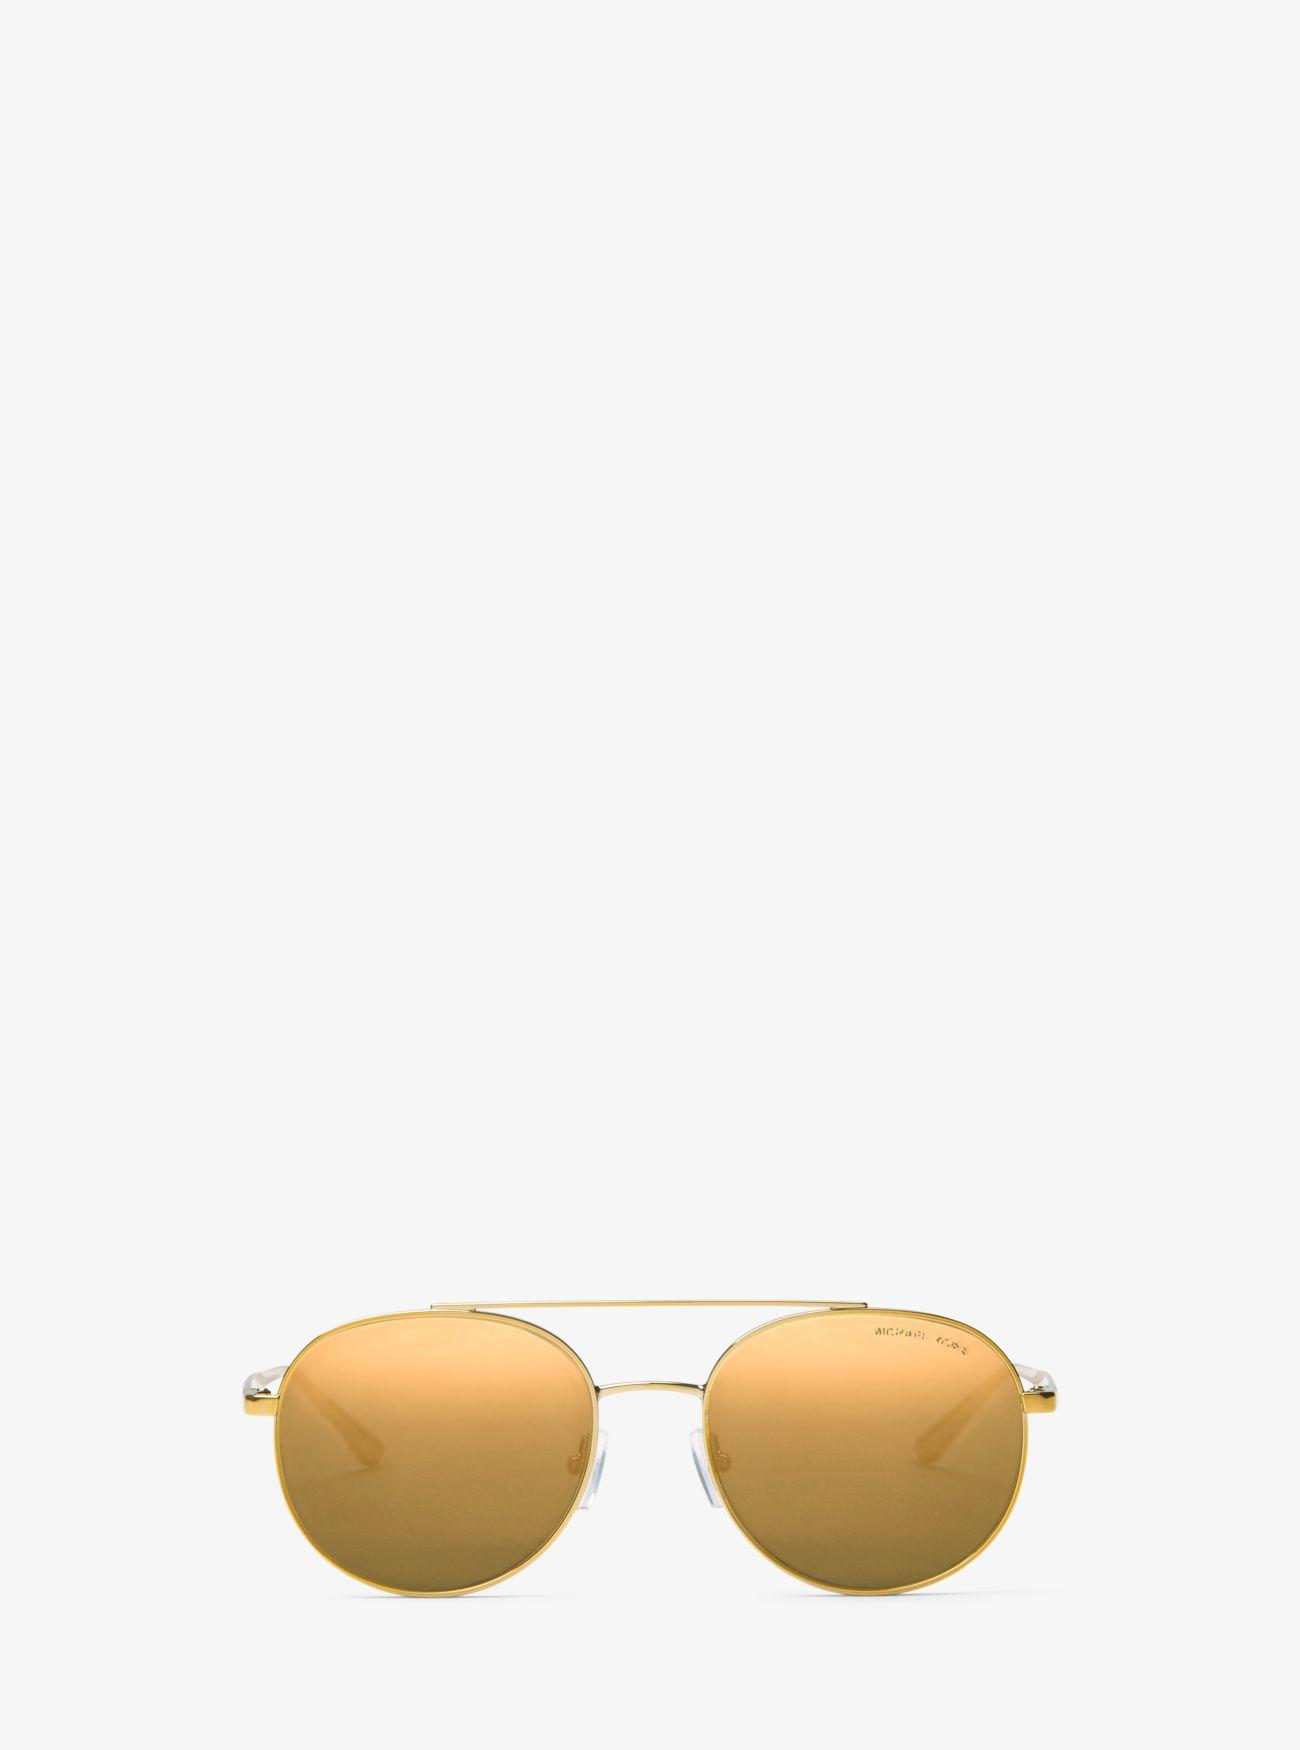 73eb67d93009 Michael Kors Lon Rounded Aviator Sunglasses in Metallic - Lyst